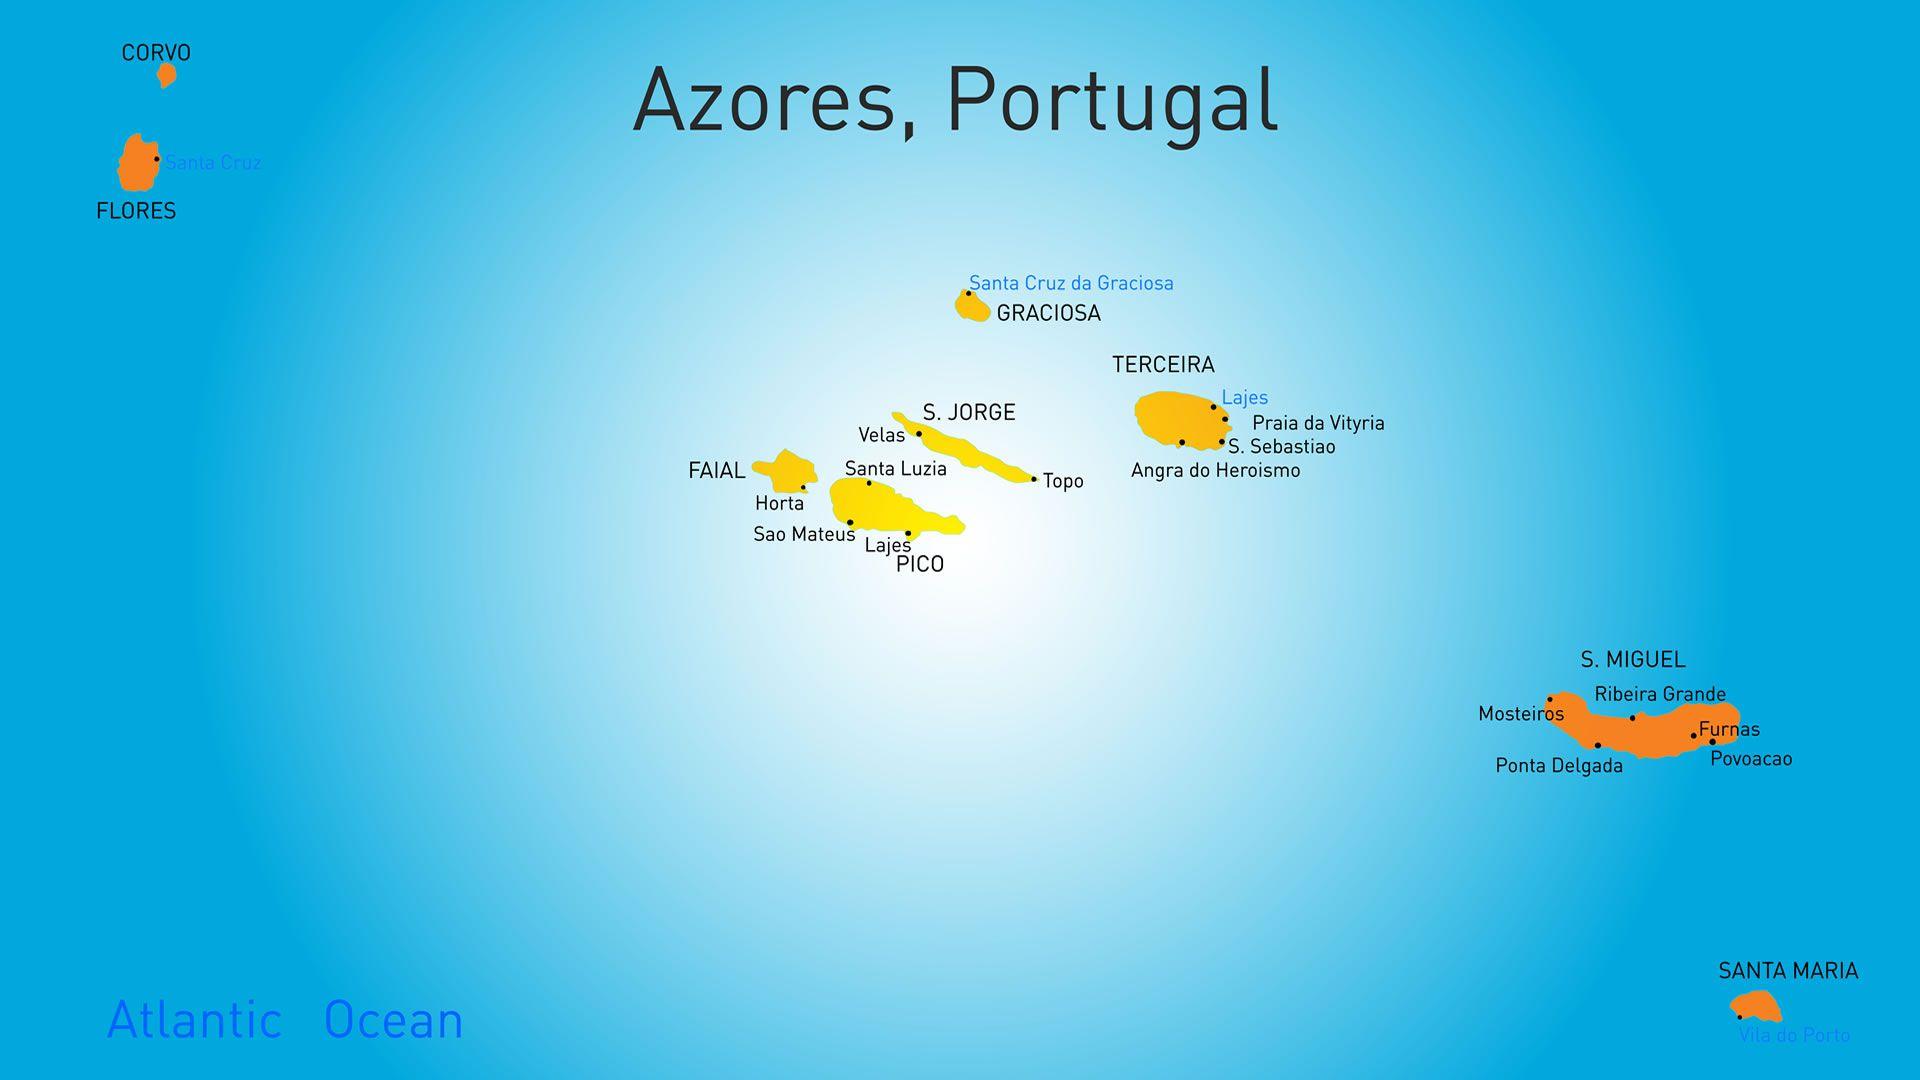 Azores Portugal Mapas Del Mundo Pinterest Azores And Portugal - Portugal map with azores